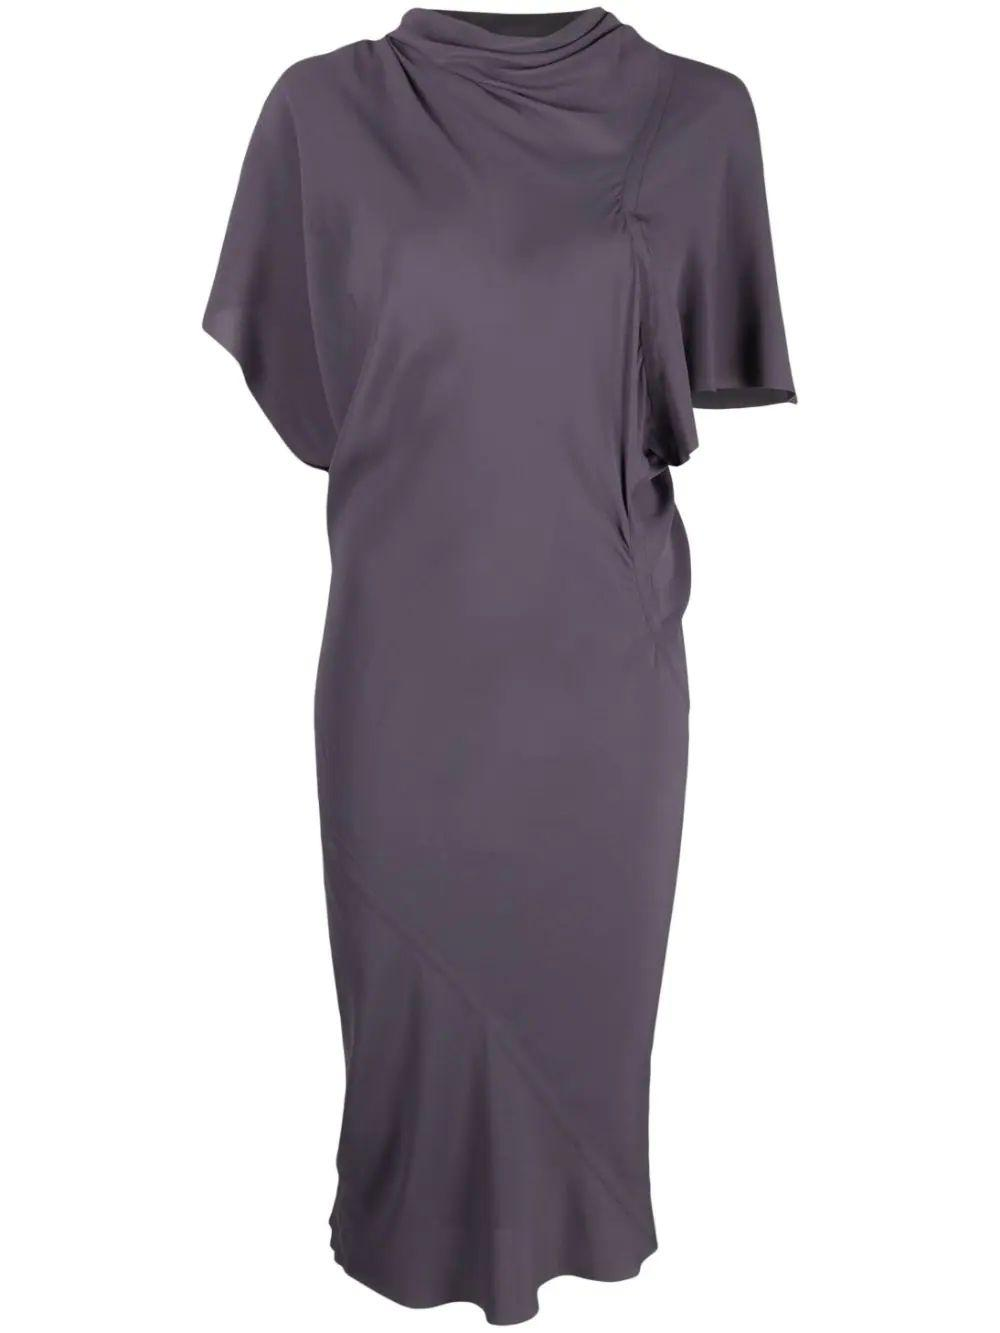 Seb Dress Item # RP02A7553